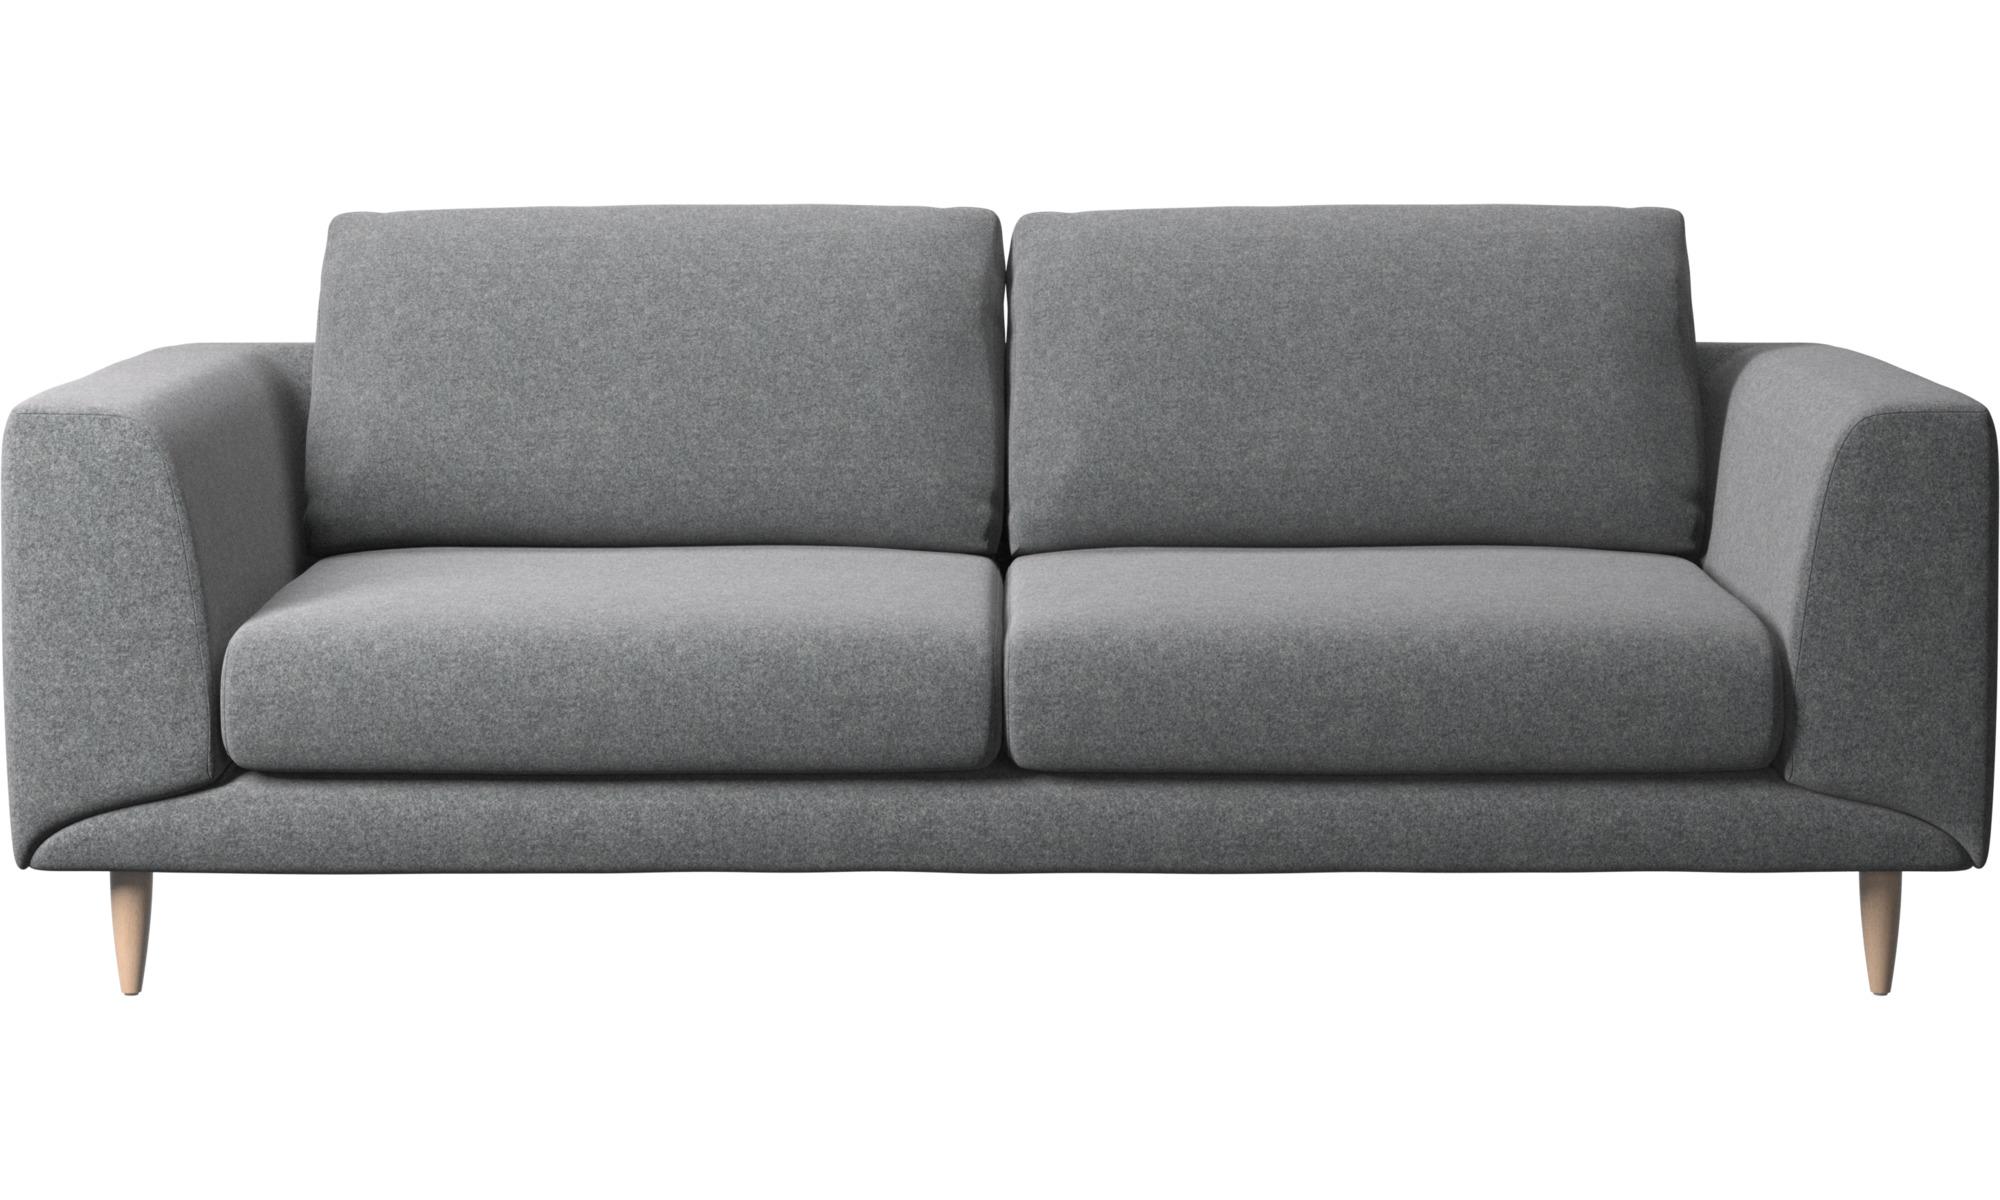 2 5 Seater Sofas Fargo Sofa Boconcept